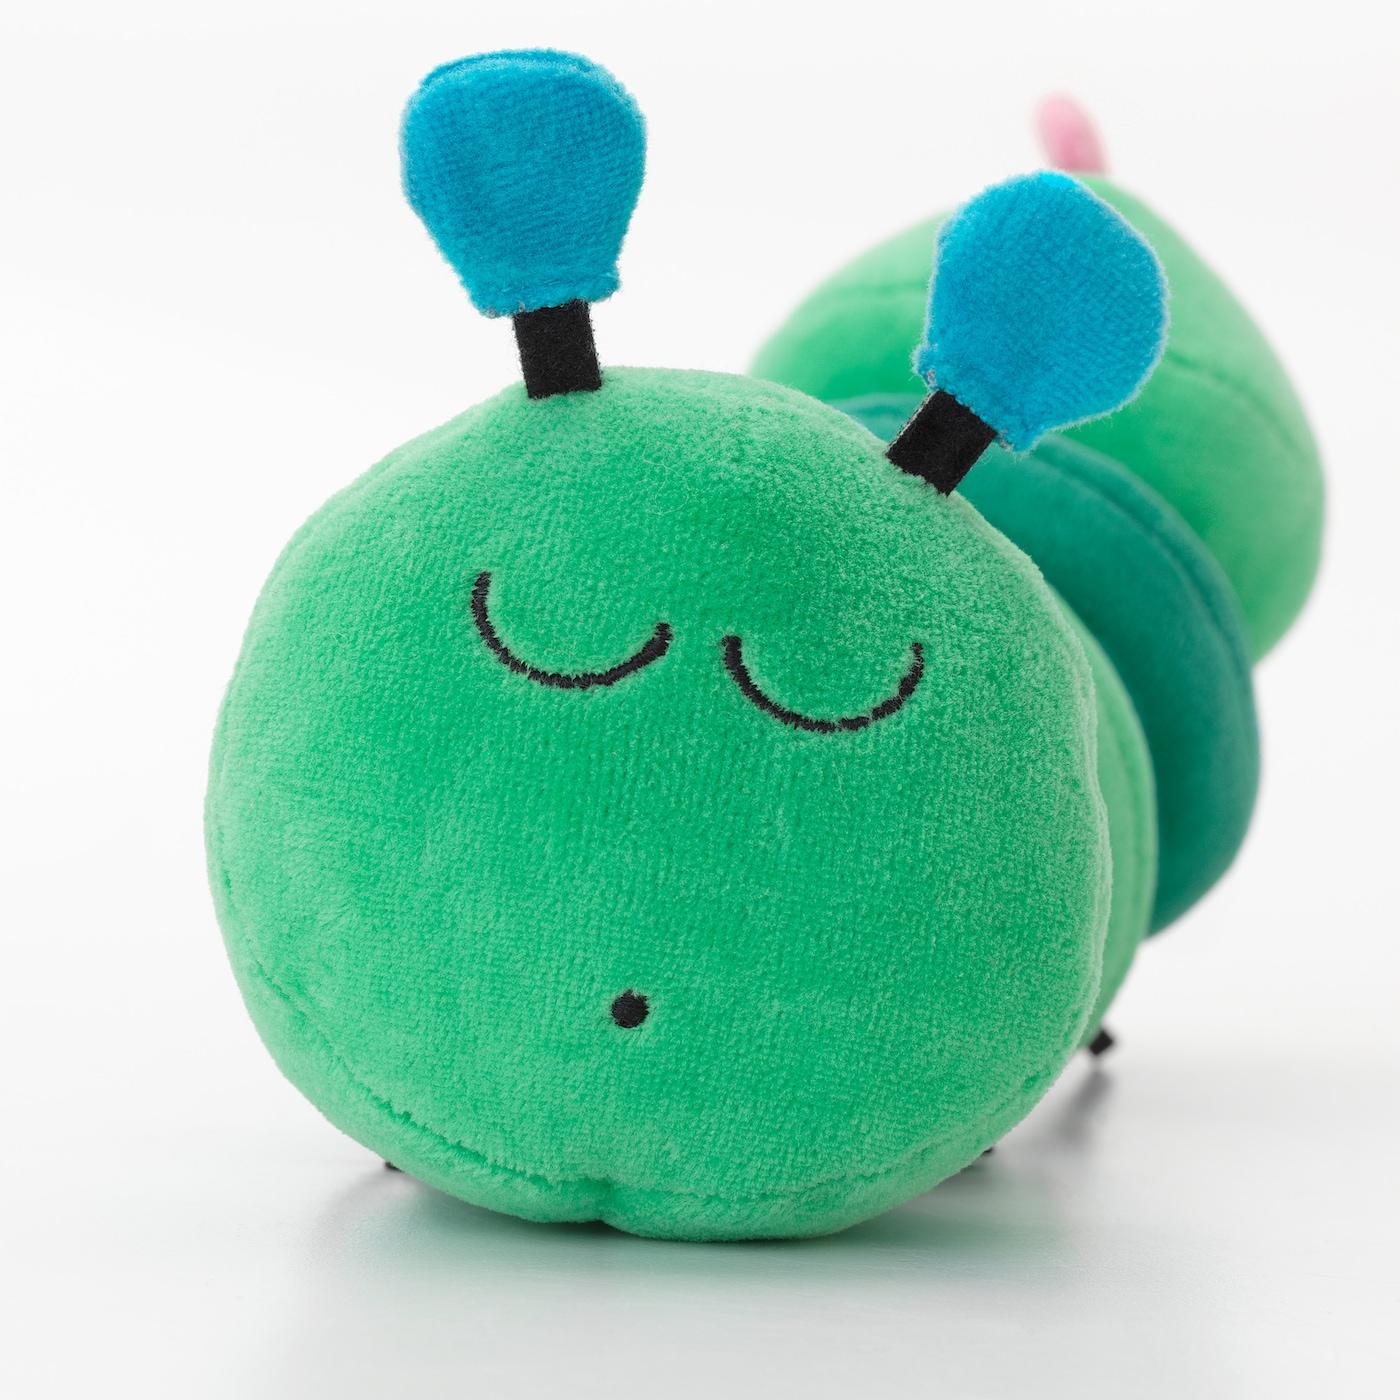 KLAPPA Musical toy, caterpillar